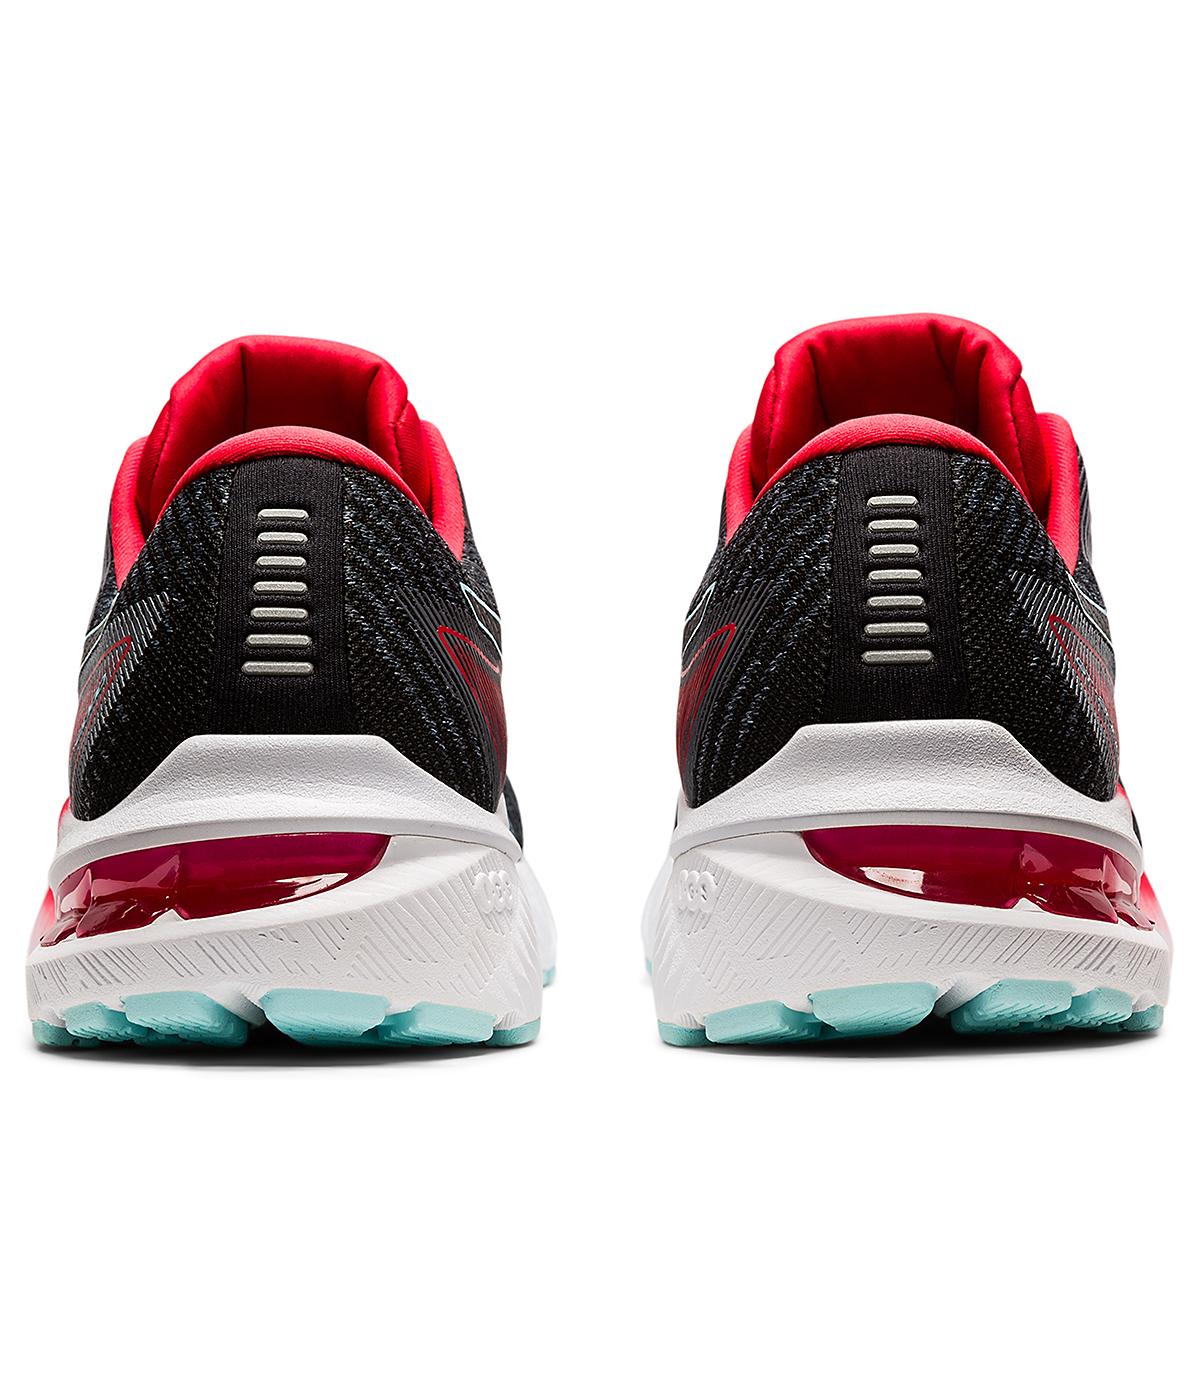 Men's Asics GT-2000 10 Running Shoe - Color: Metropolis/Electric Red - Size: 7 - Width: Regular, Metropolis/Electric Red, large, image 5